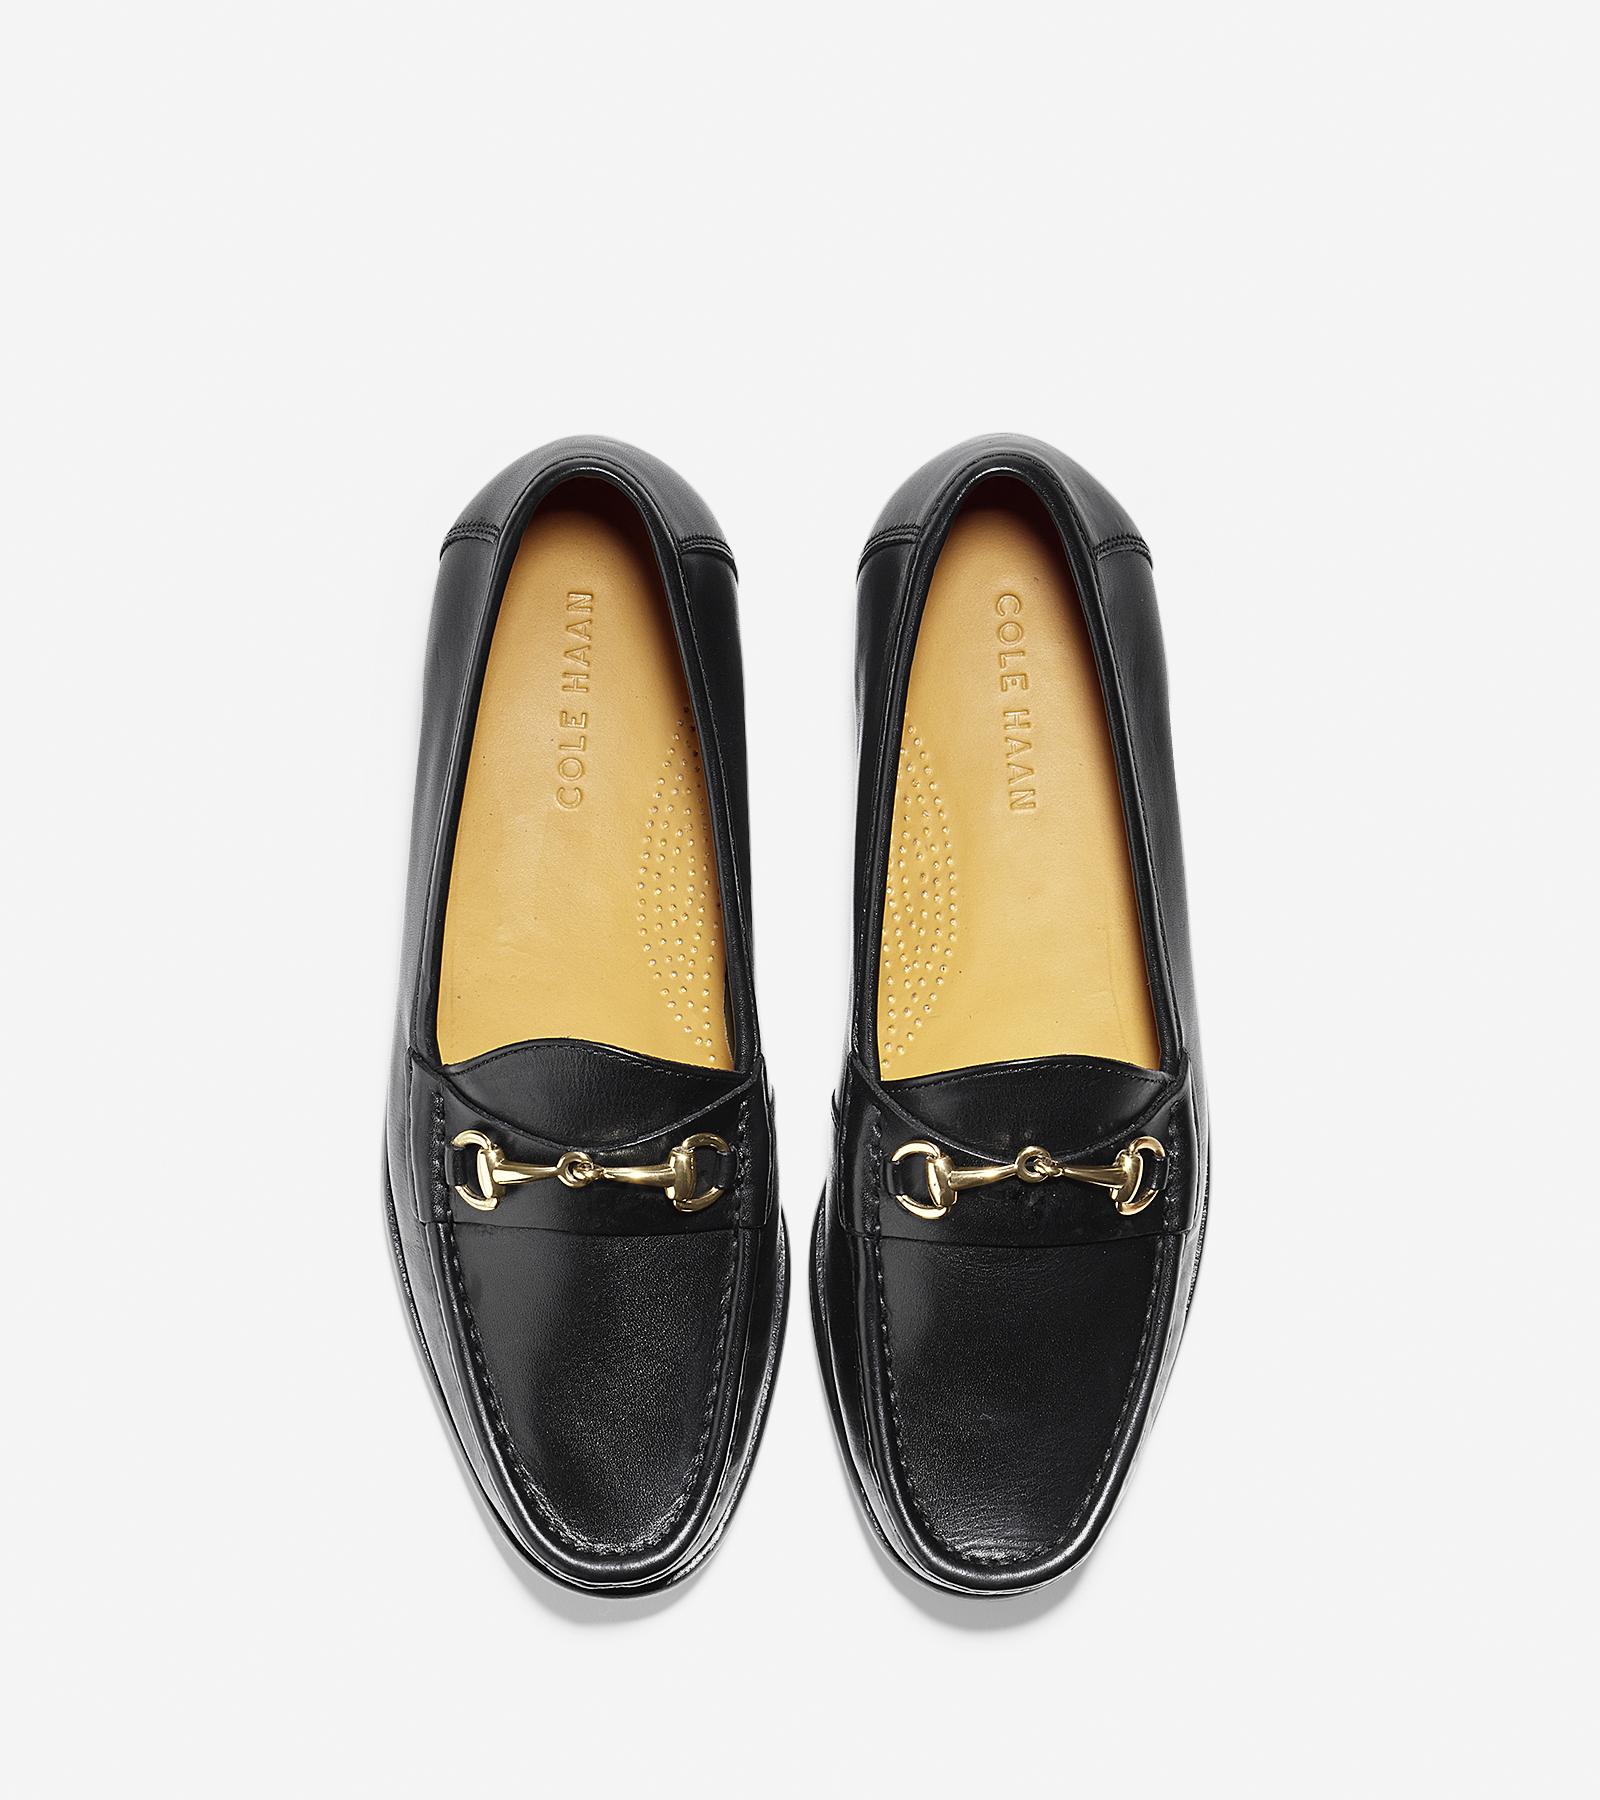 90f4c80cb8d Men's Ascot Bit Loafers in Black : Sale | Cole Haan